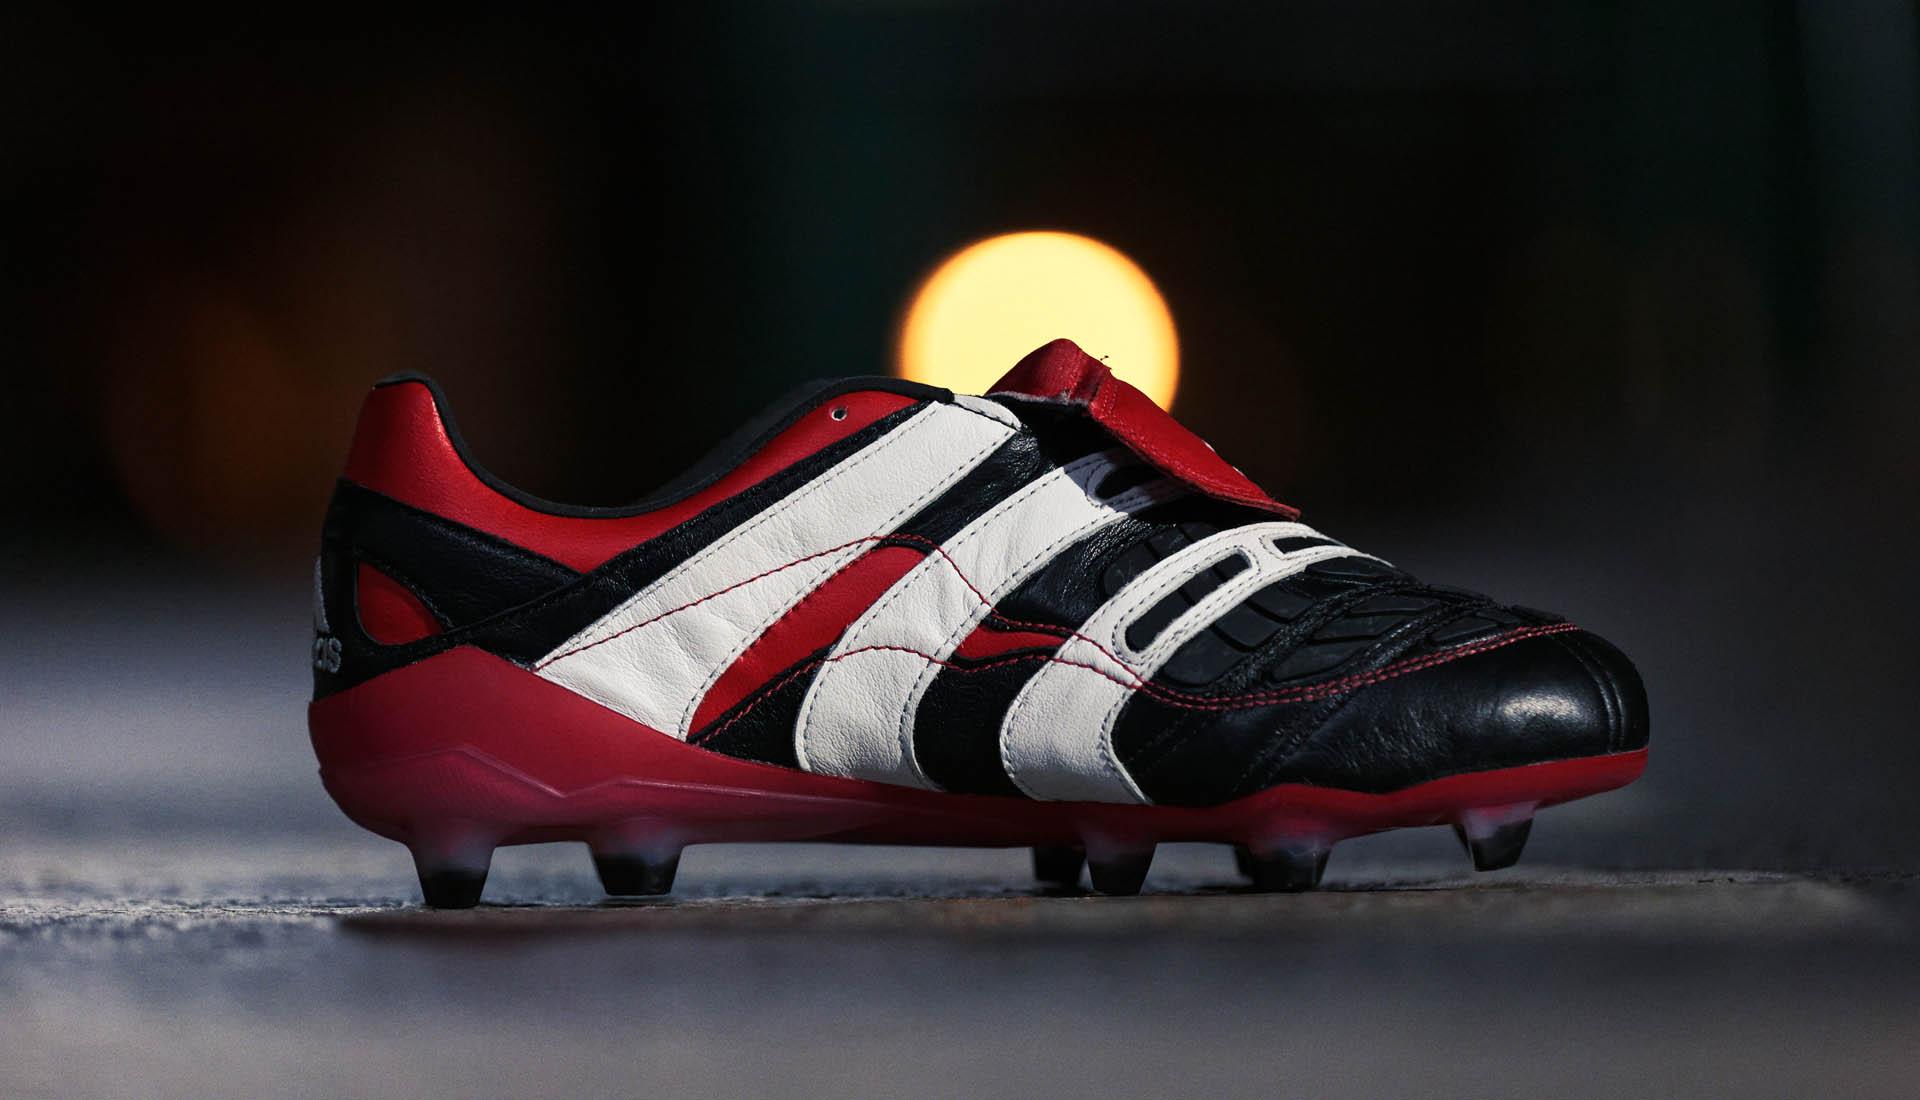 finest selection 86934 ef706 2-adidas-predator-accelerator-black-red-white-min.